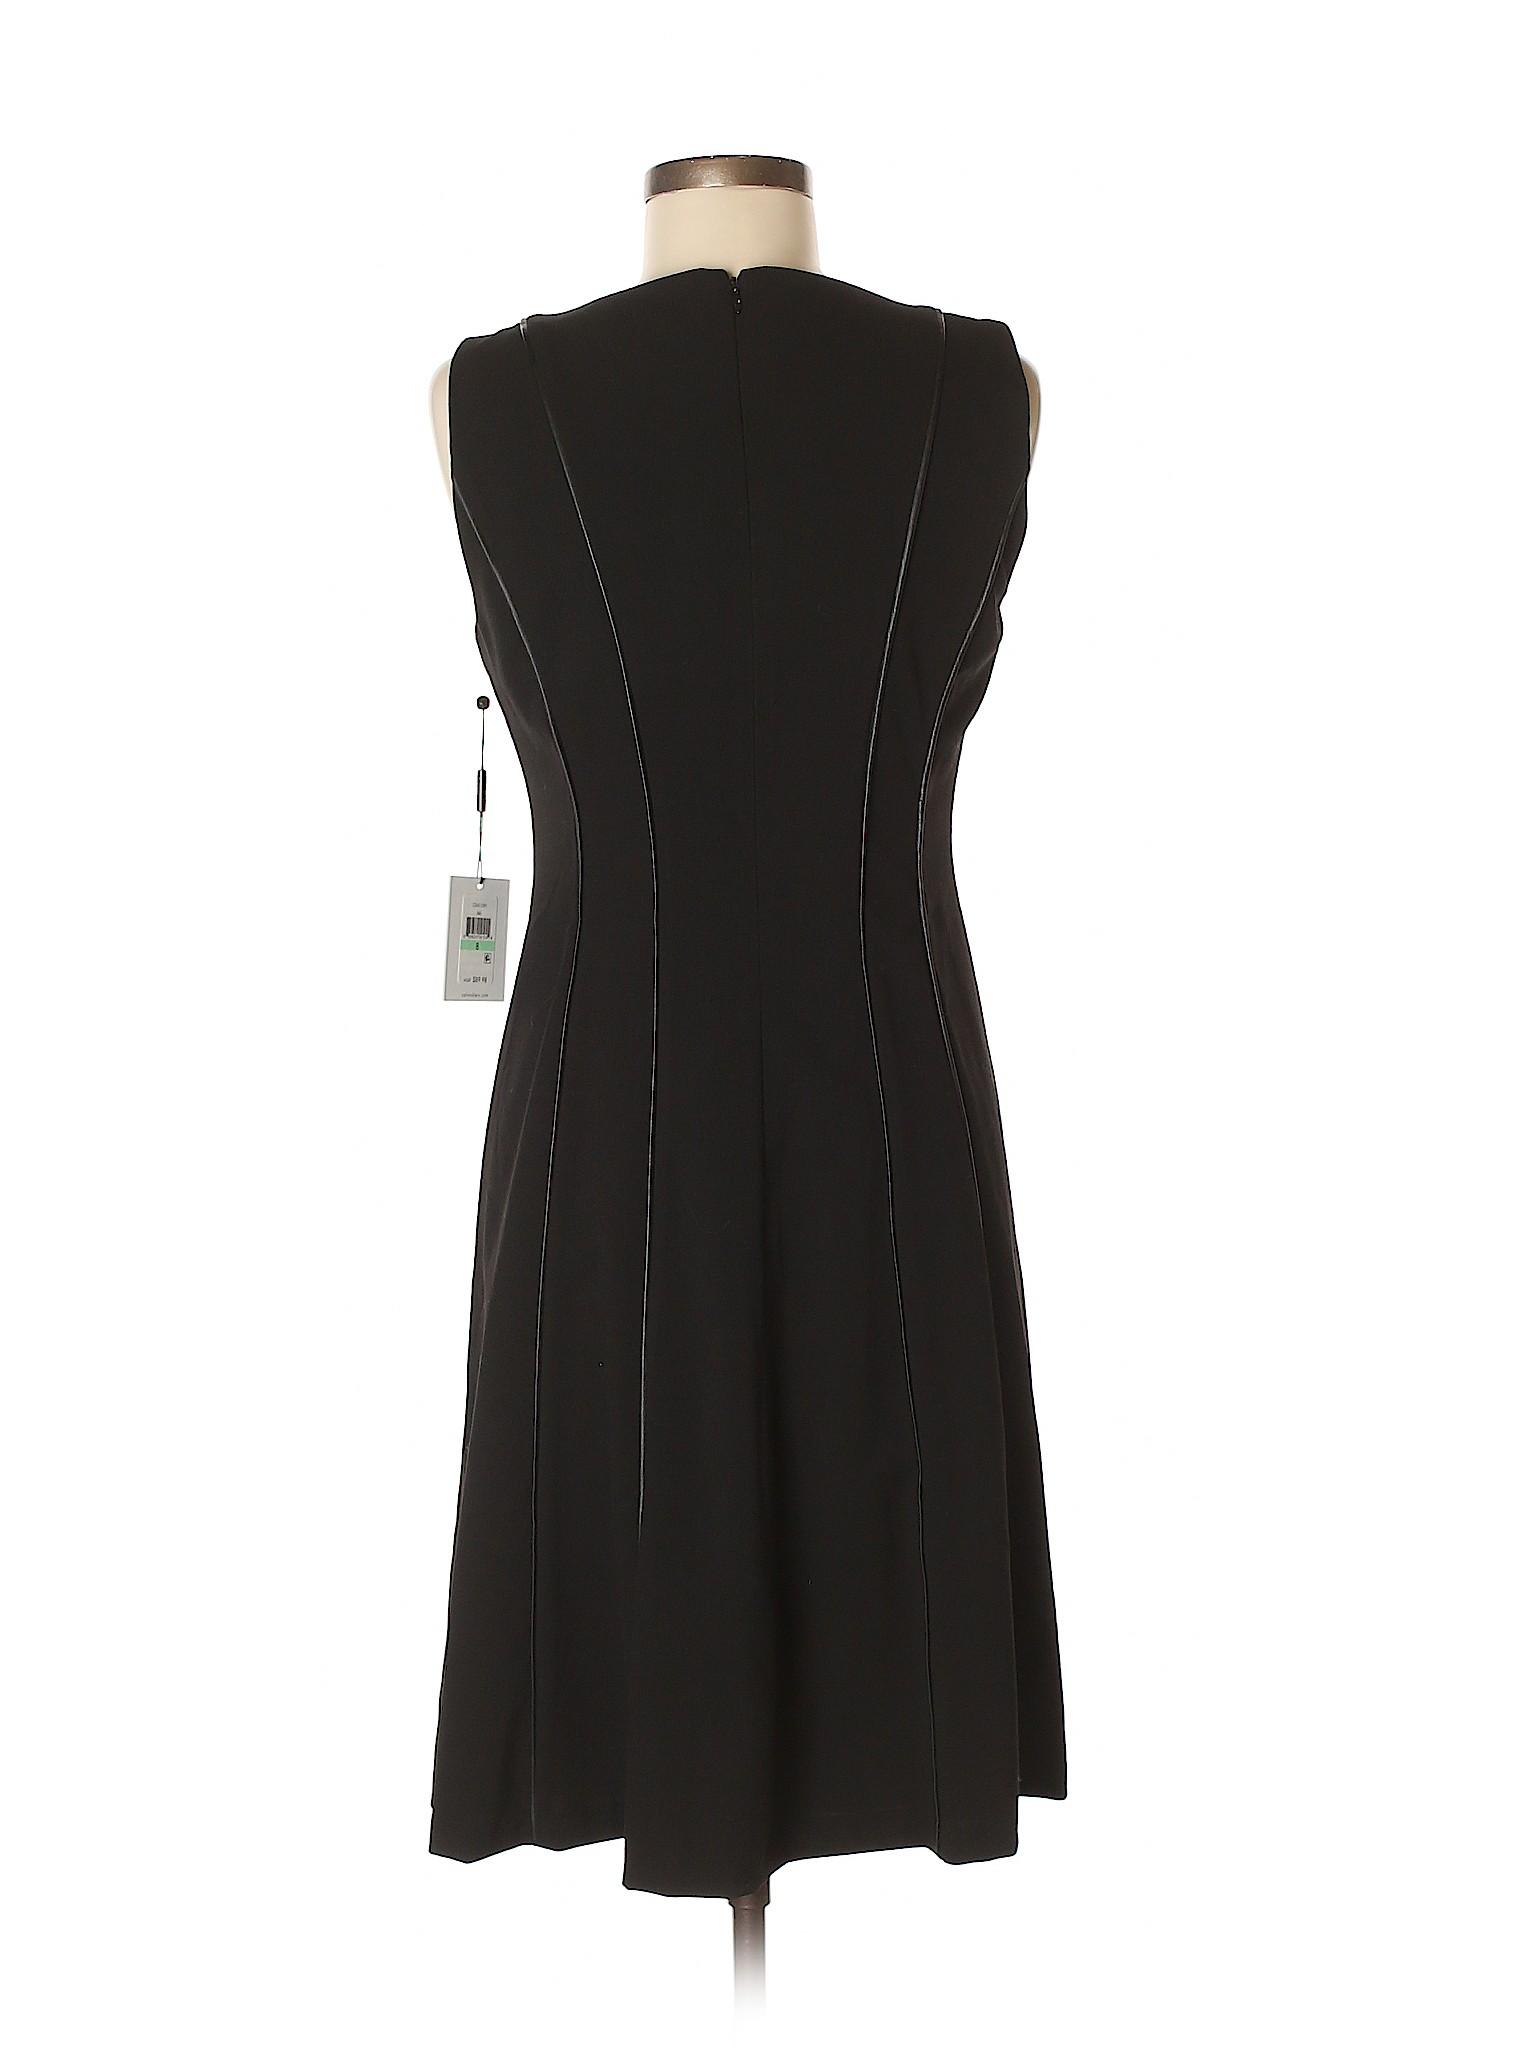 Casual Klein Dress Calvin Selling Selling Calvin wtqgn1IxXP